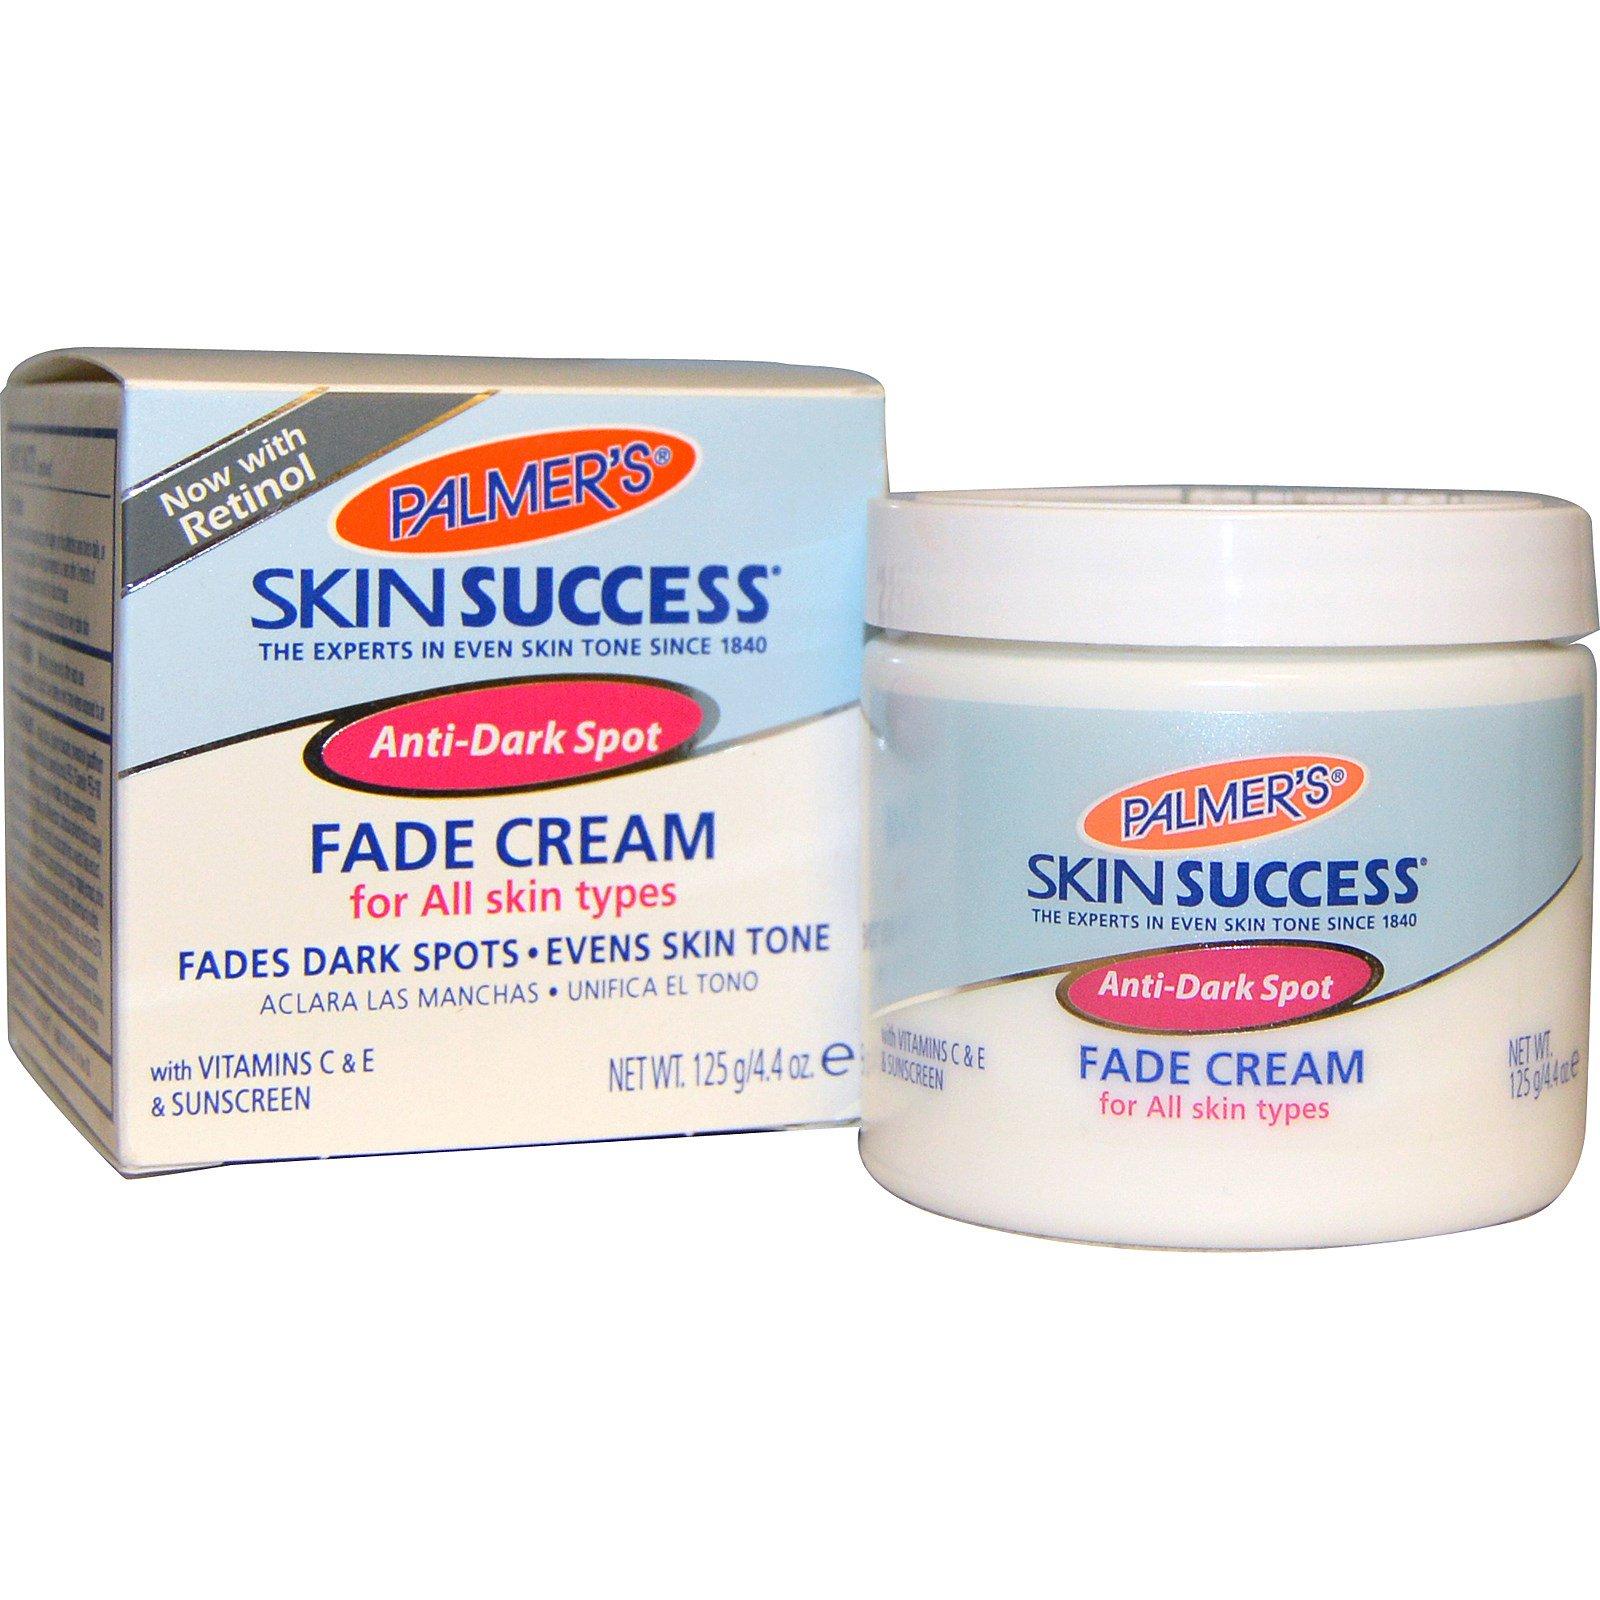 Palmers skin cream